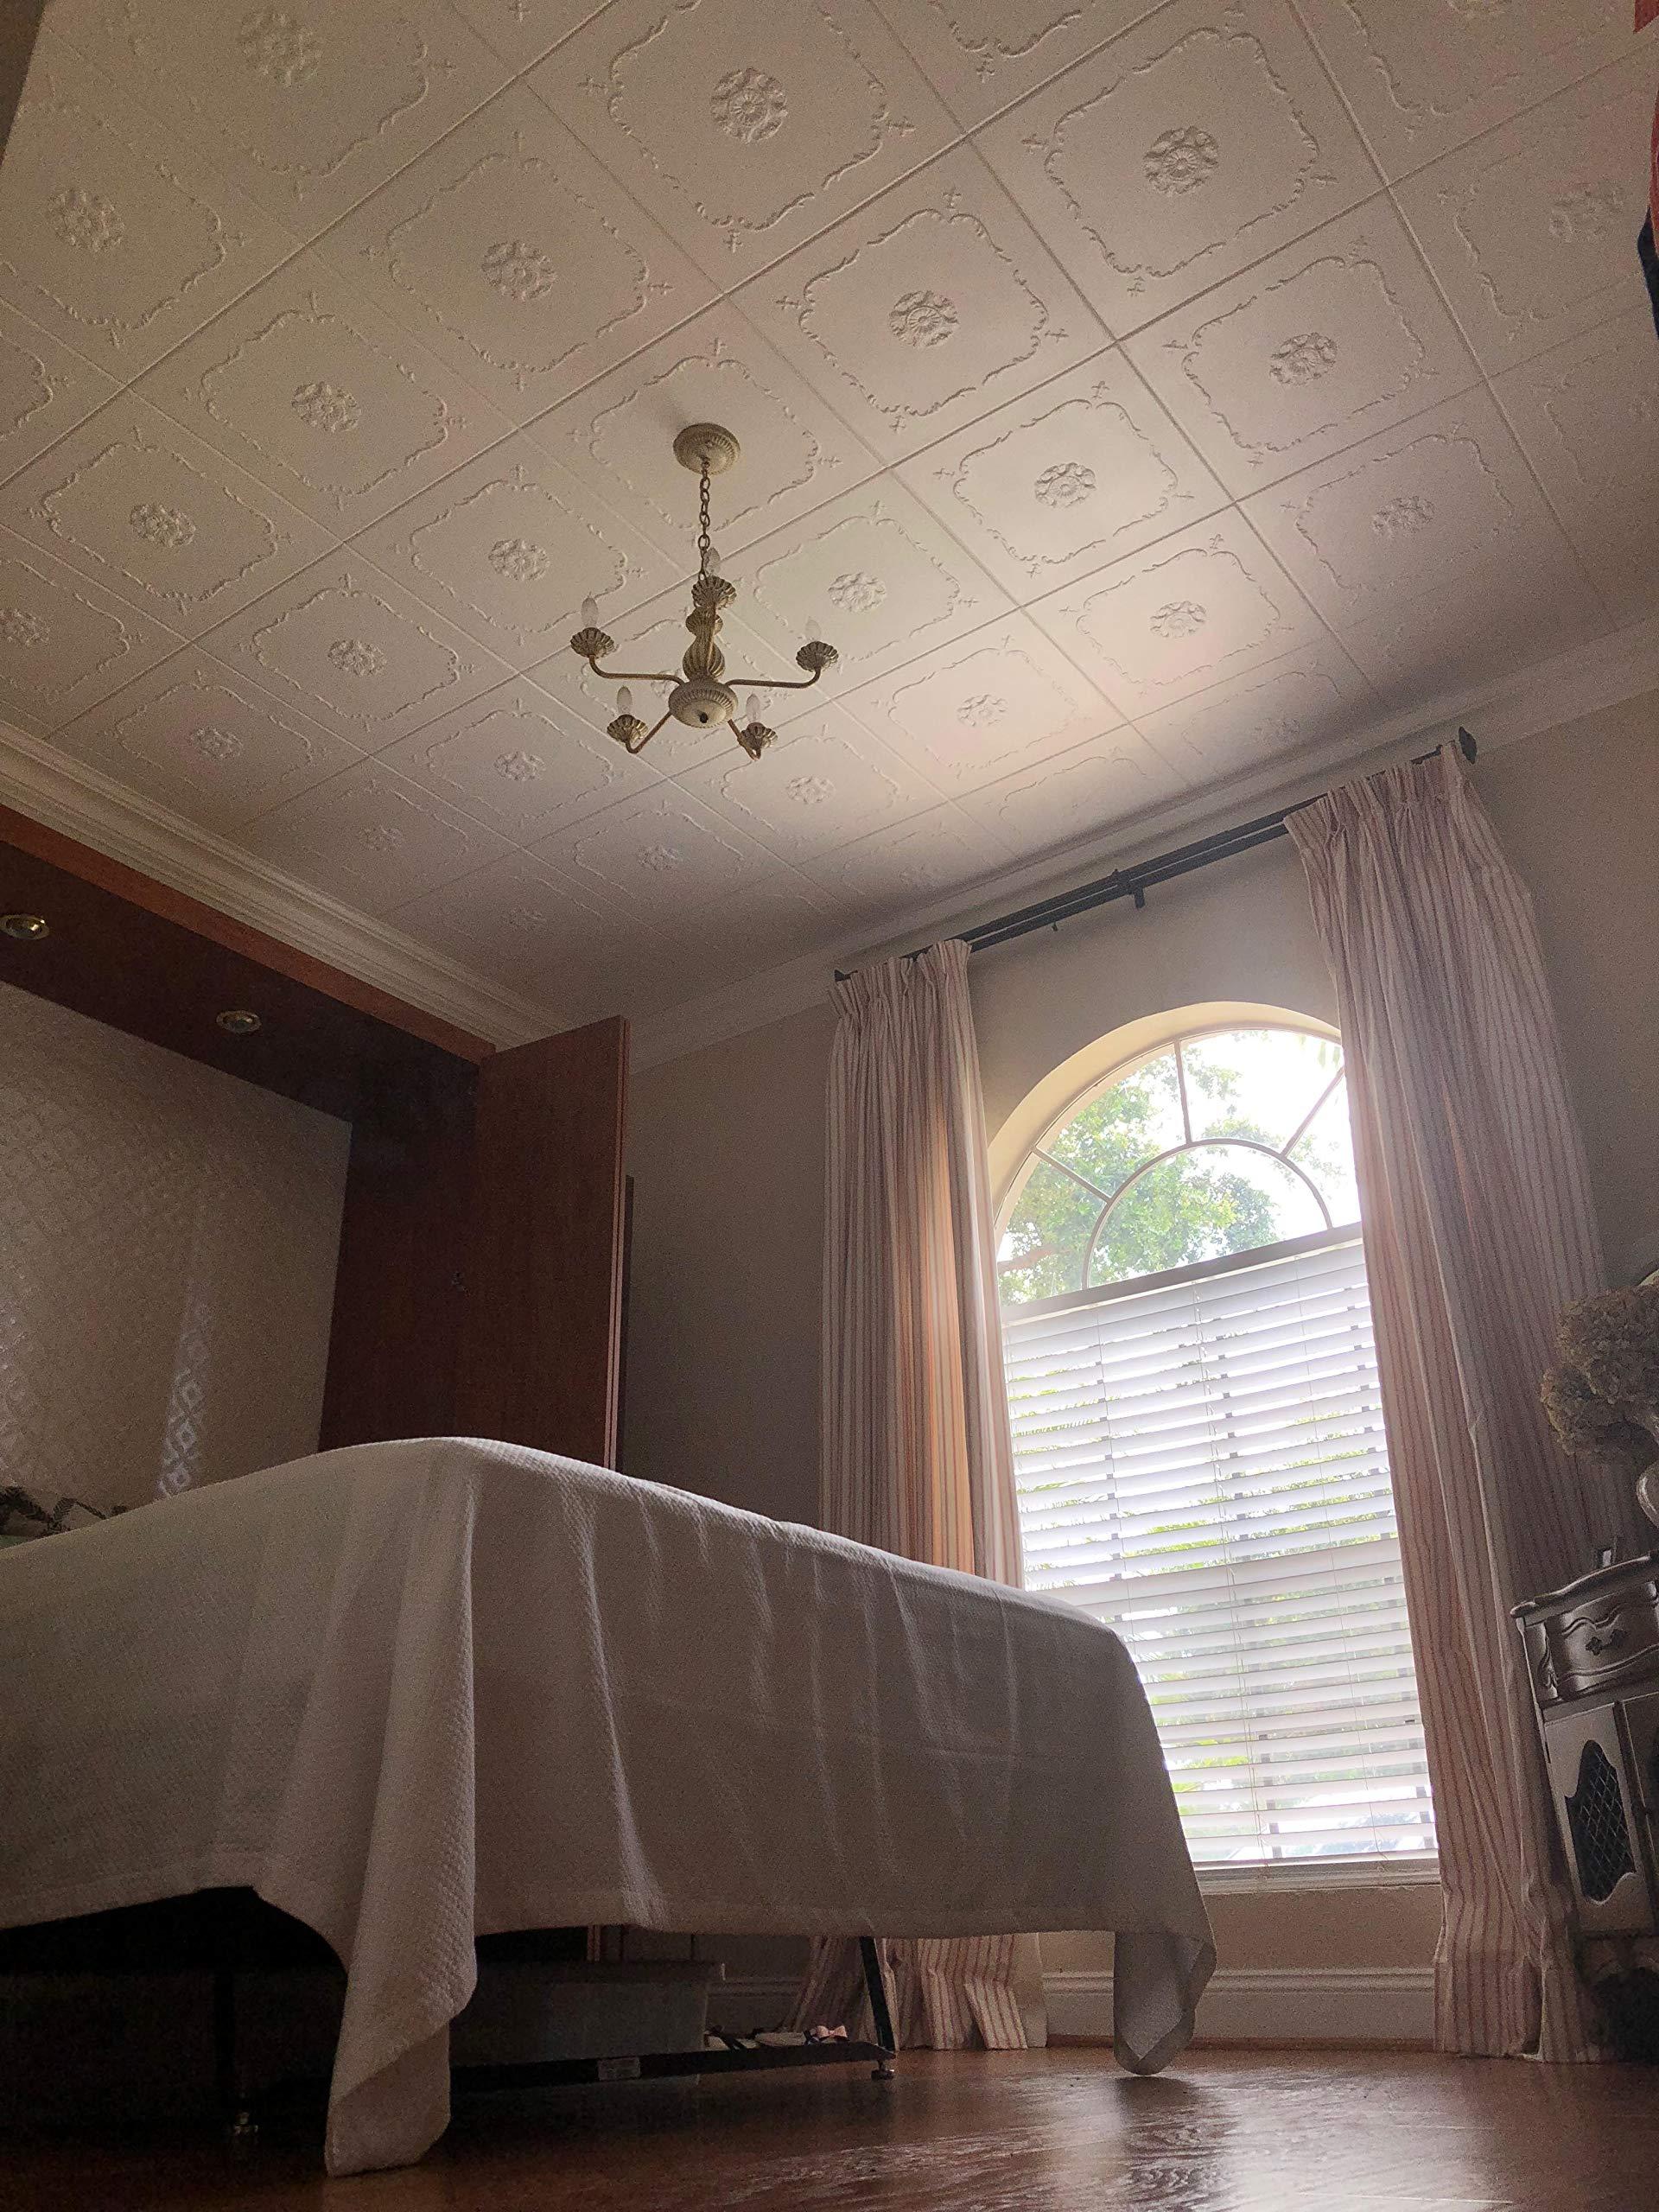 A la Maison Ceilings 818 Bourbon Street - Styrofoam Ceiling Tile (Package of 8 Tiles), Plain White